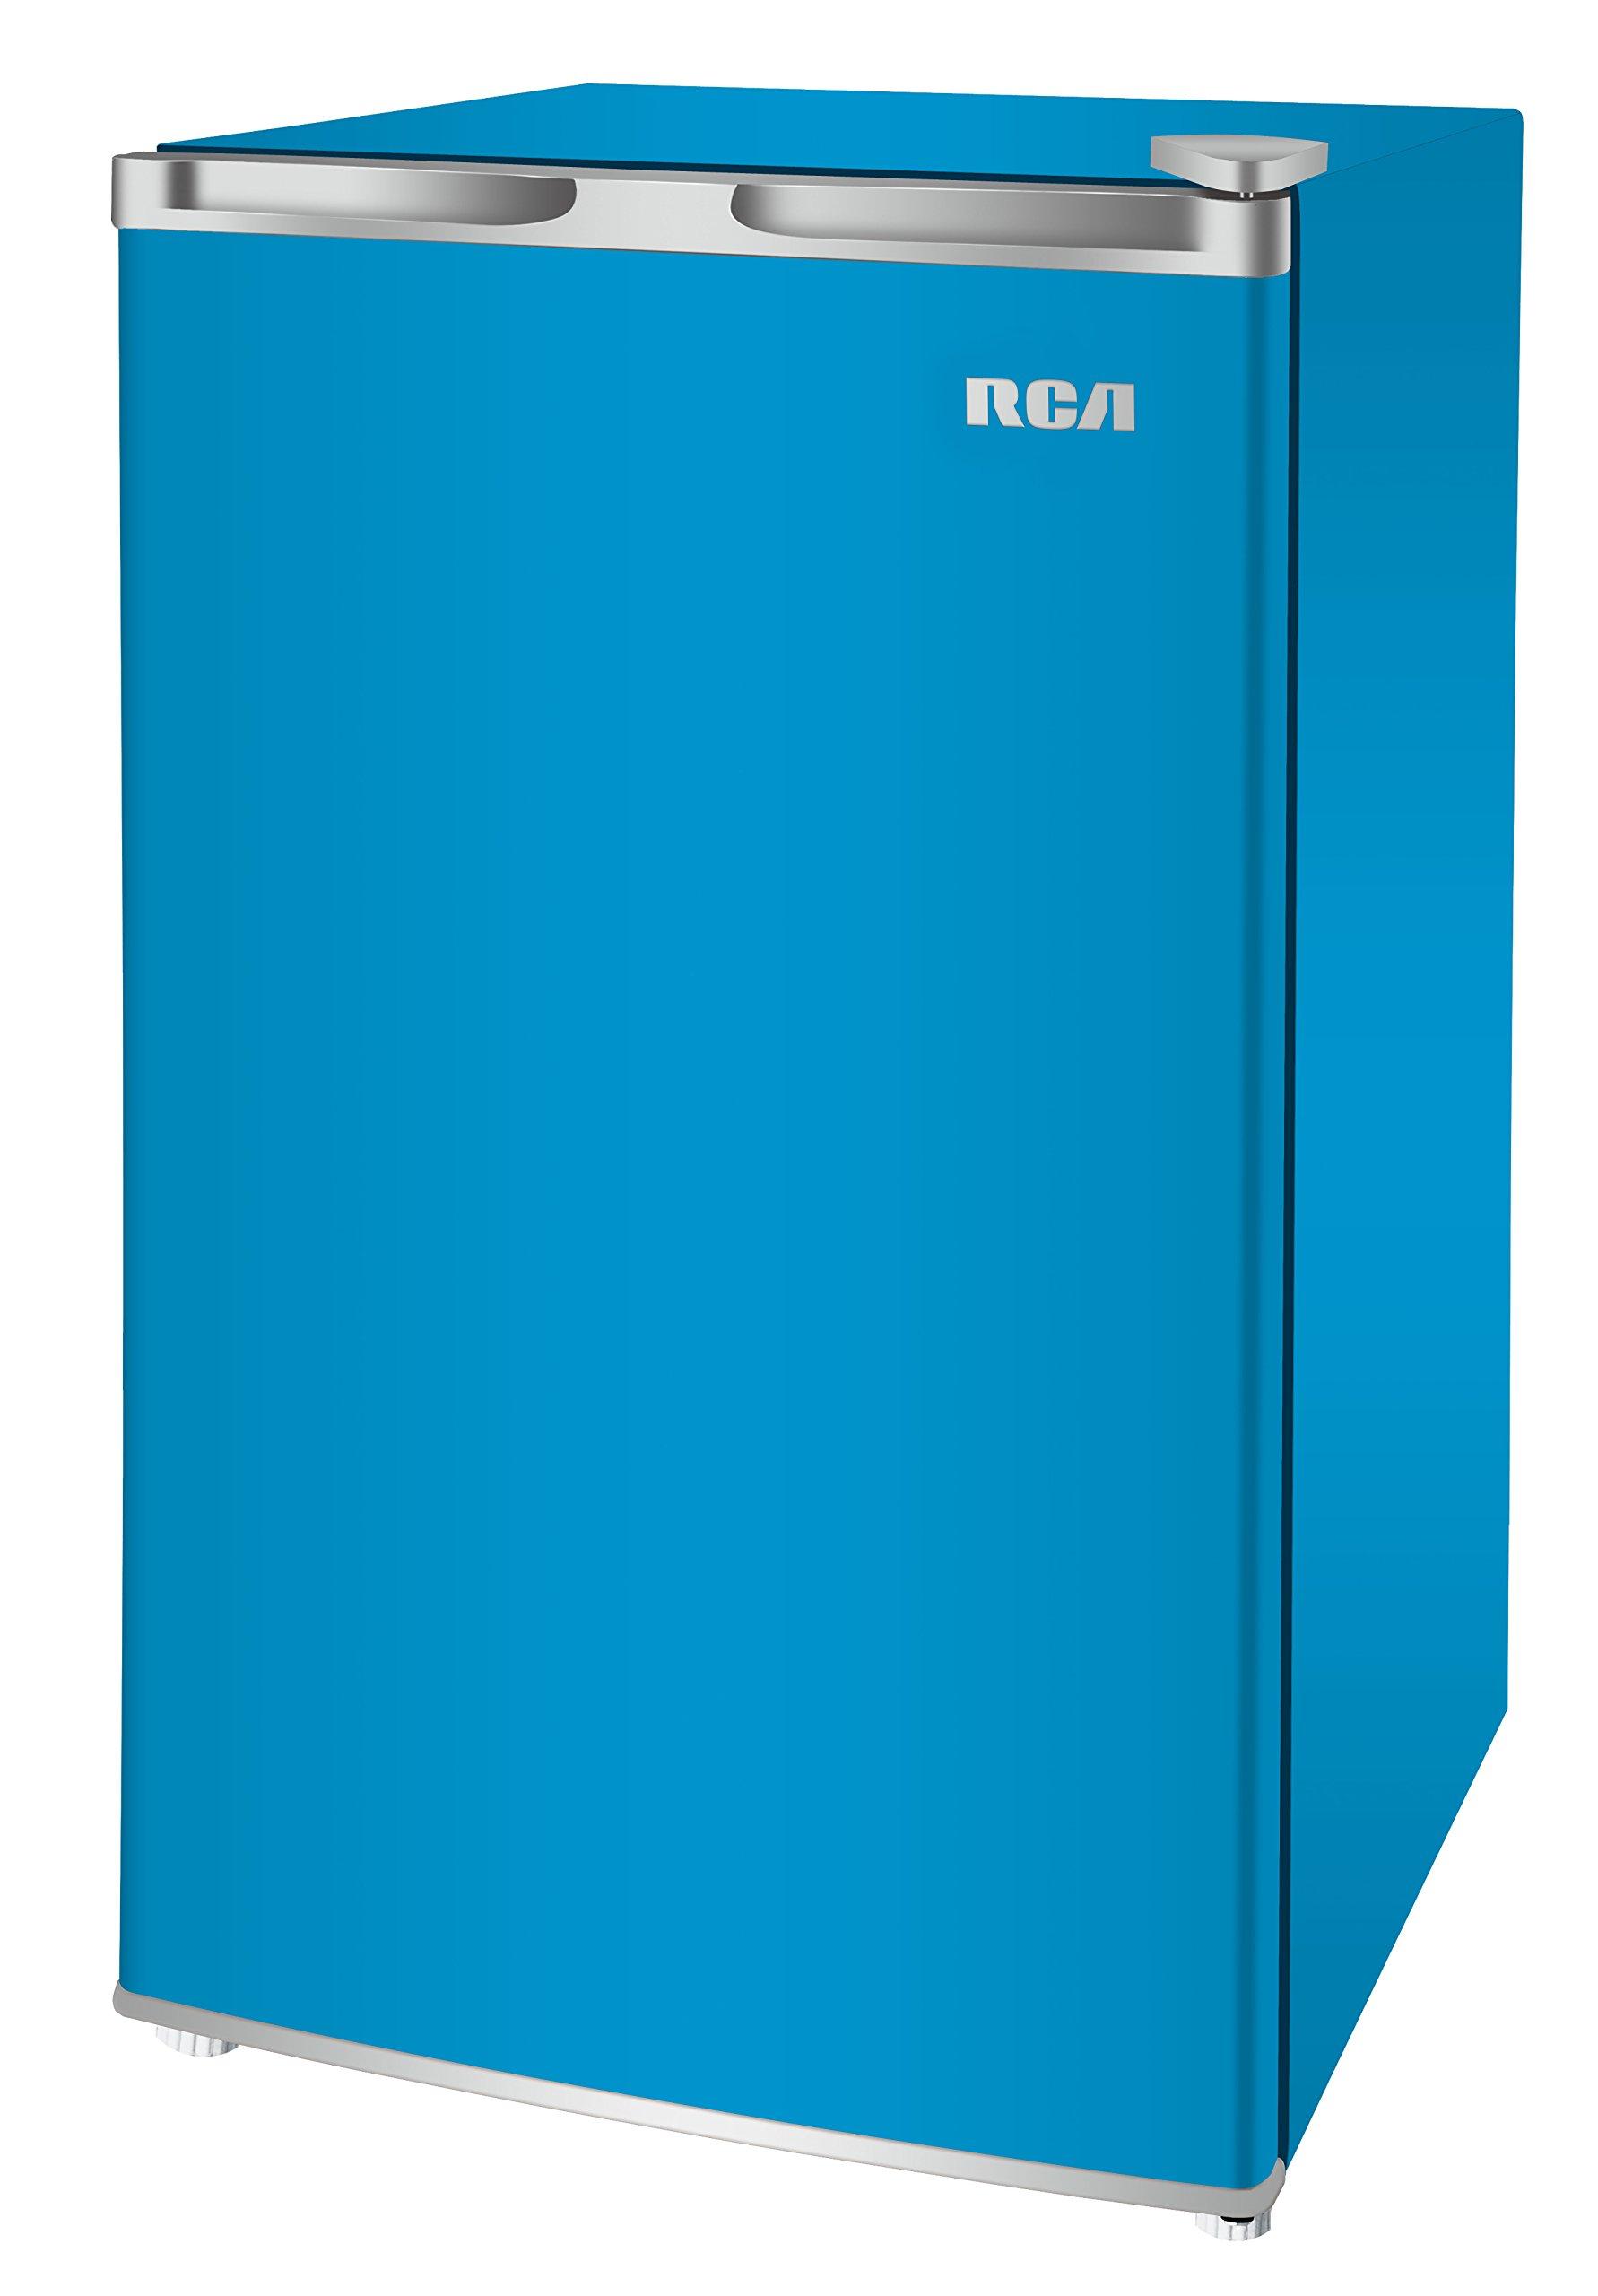 RCA RFR321-FR320/8 IGLOO Mini Refrigerator, 3.2 Cu Ft Fridge, Blue